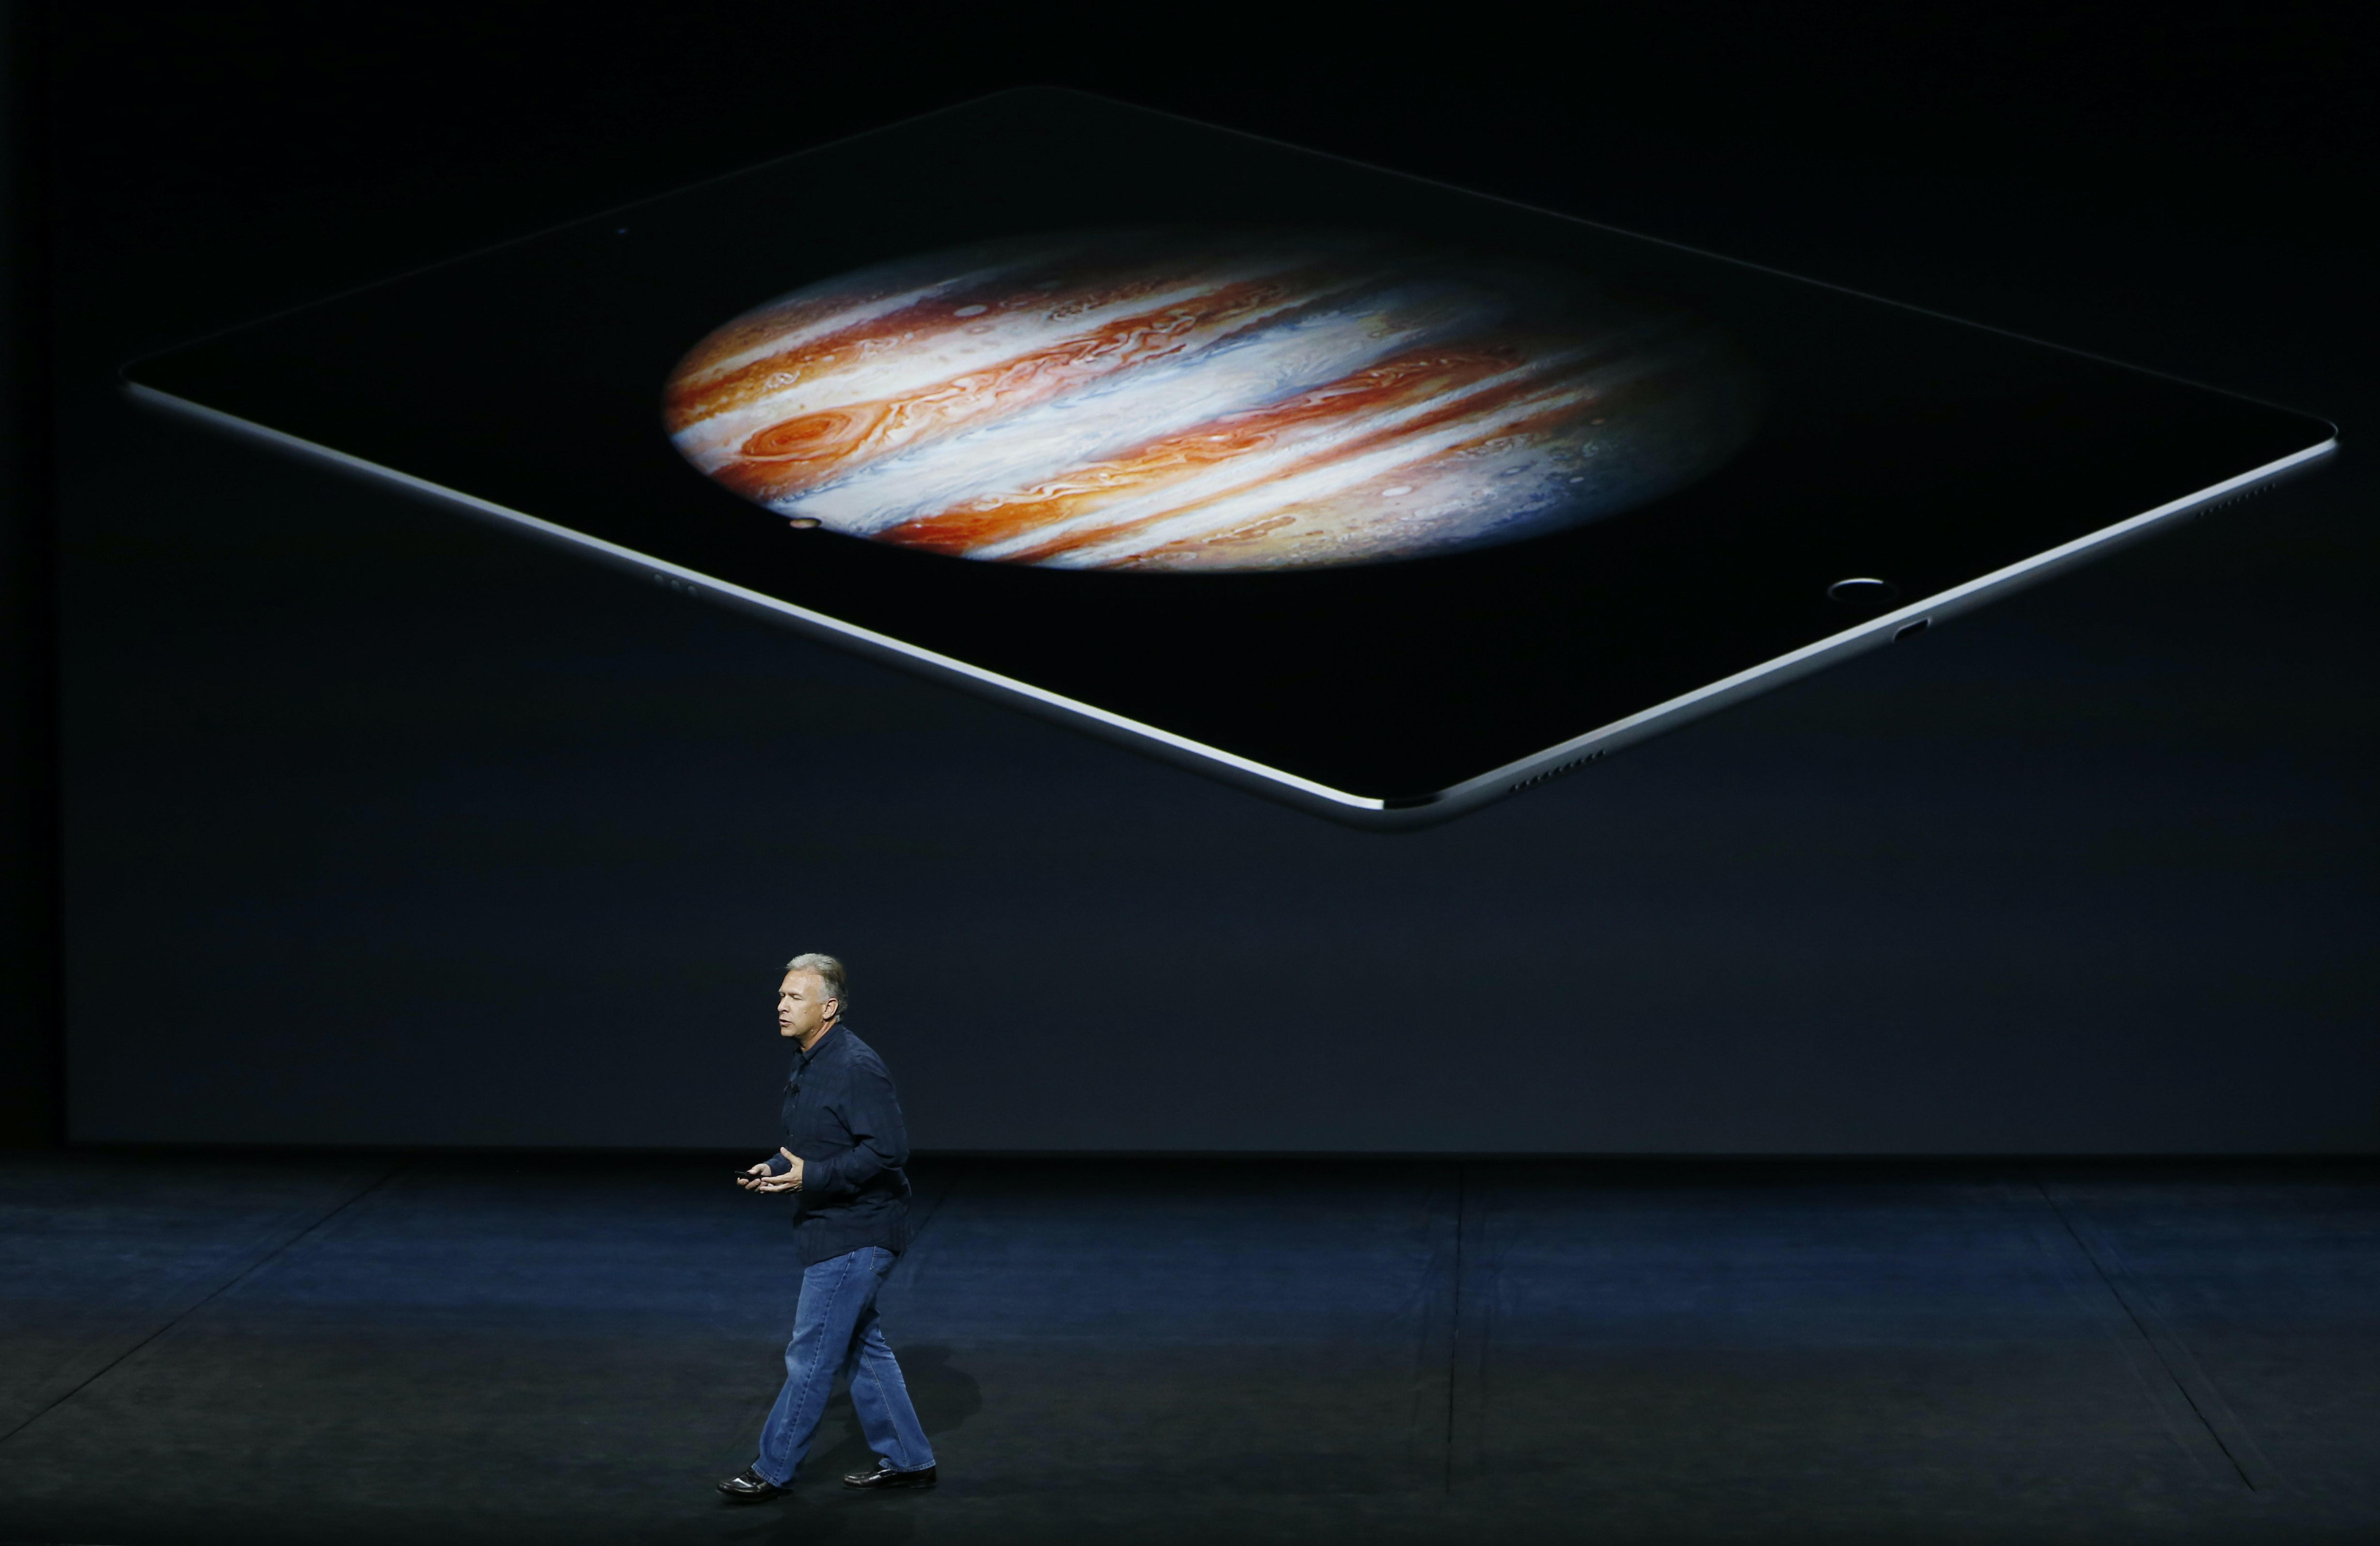 Apple marketing SVP Phil Schiller introduces the 12.9-inch iPad Pro.